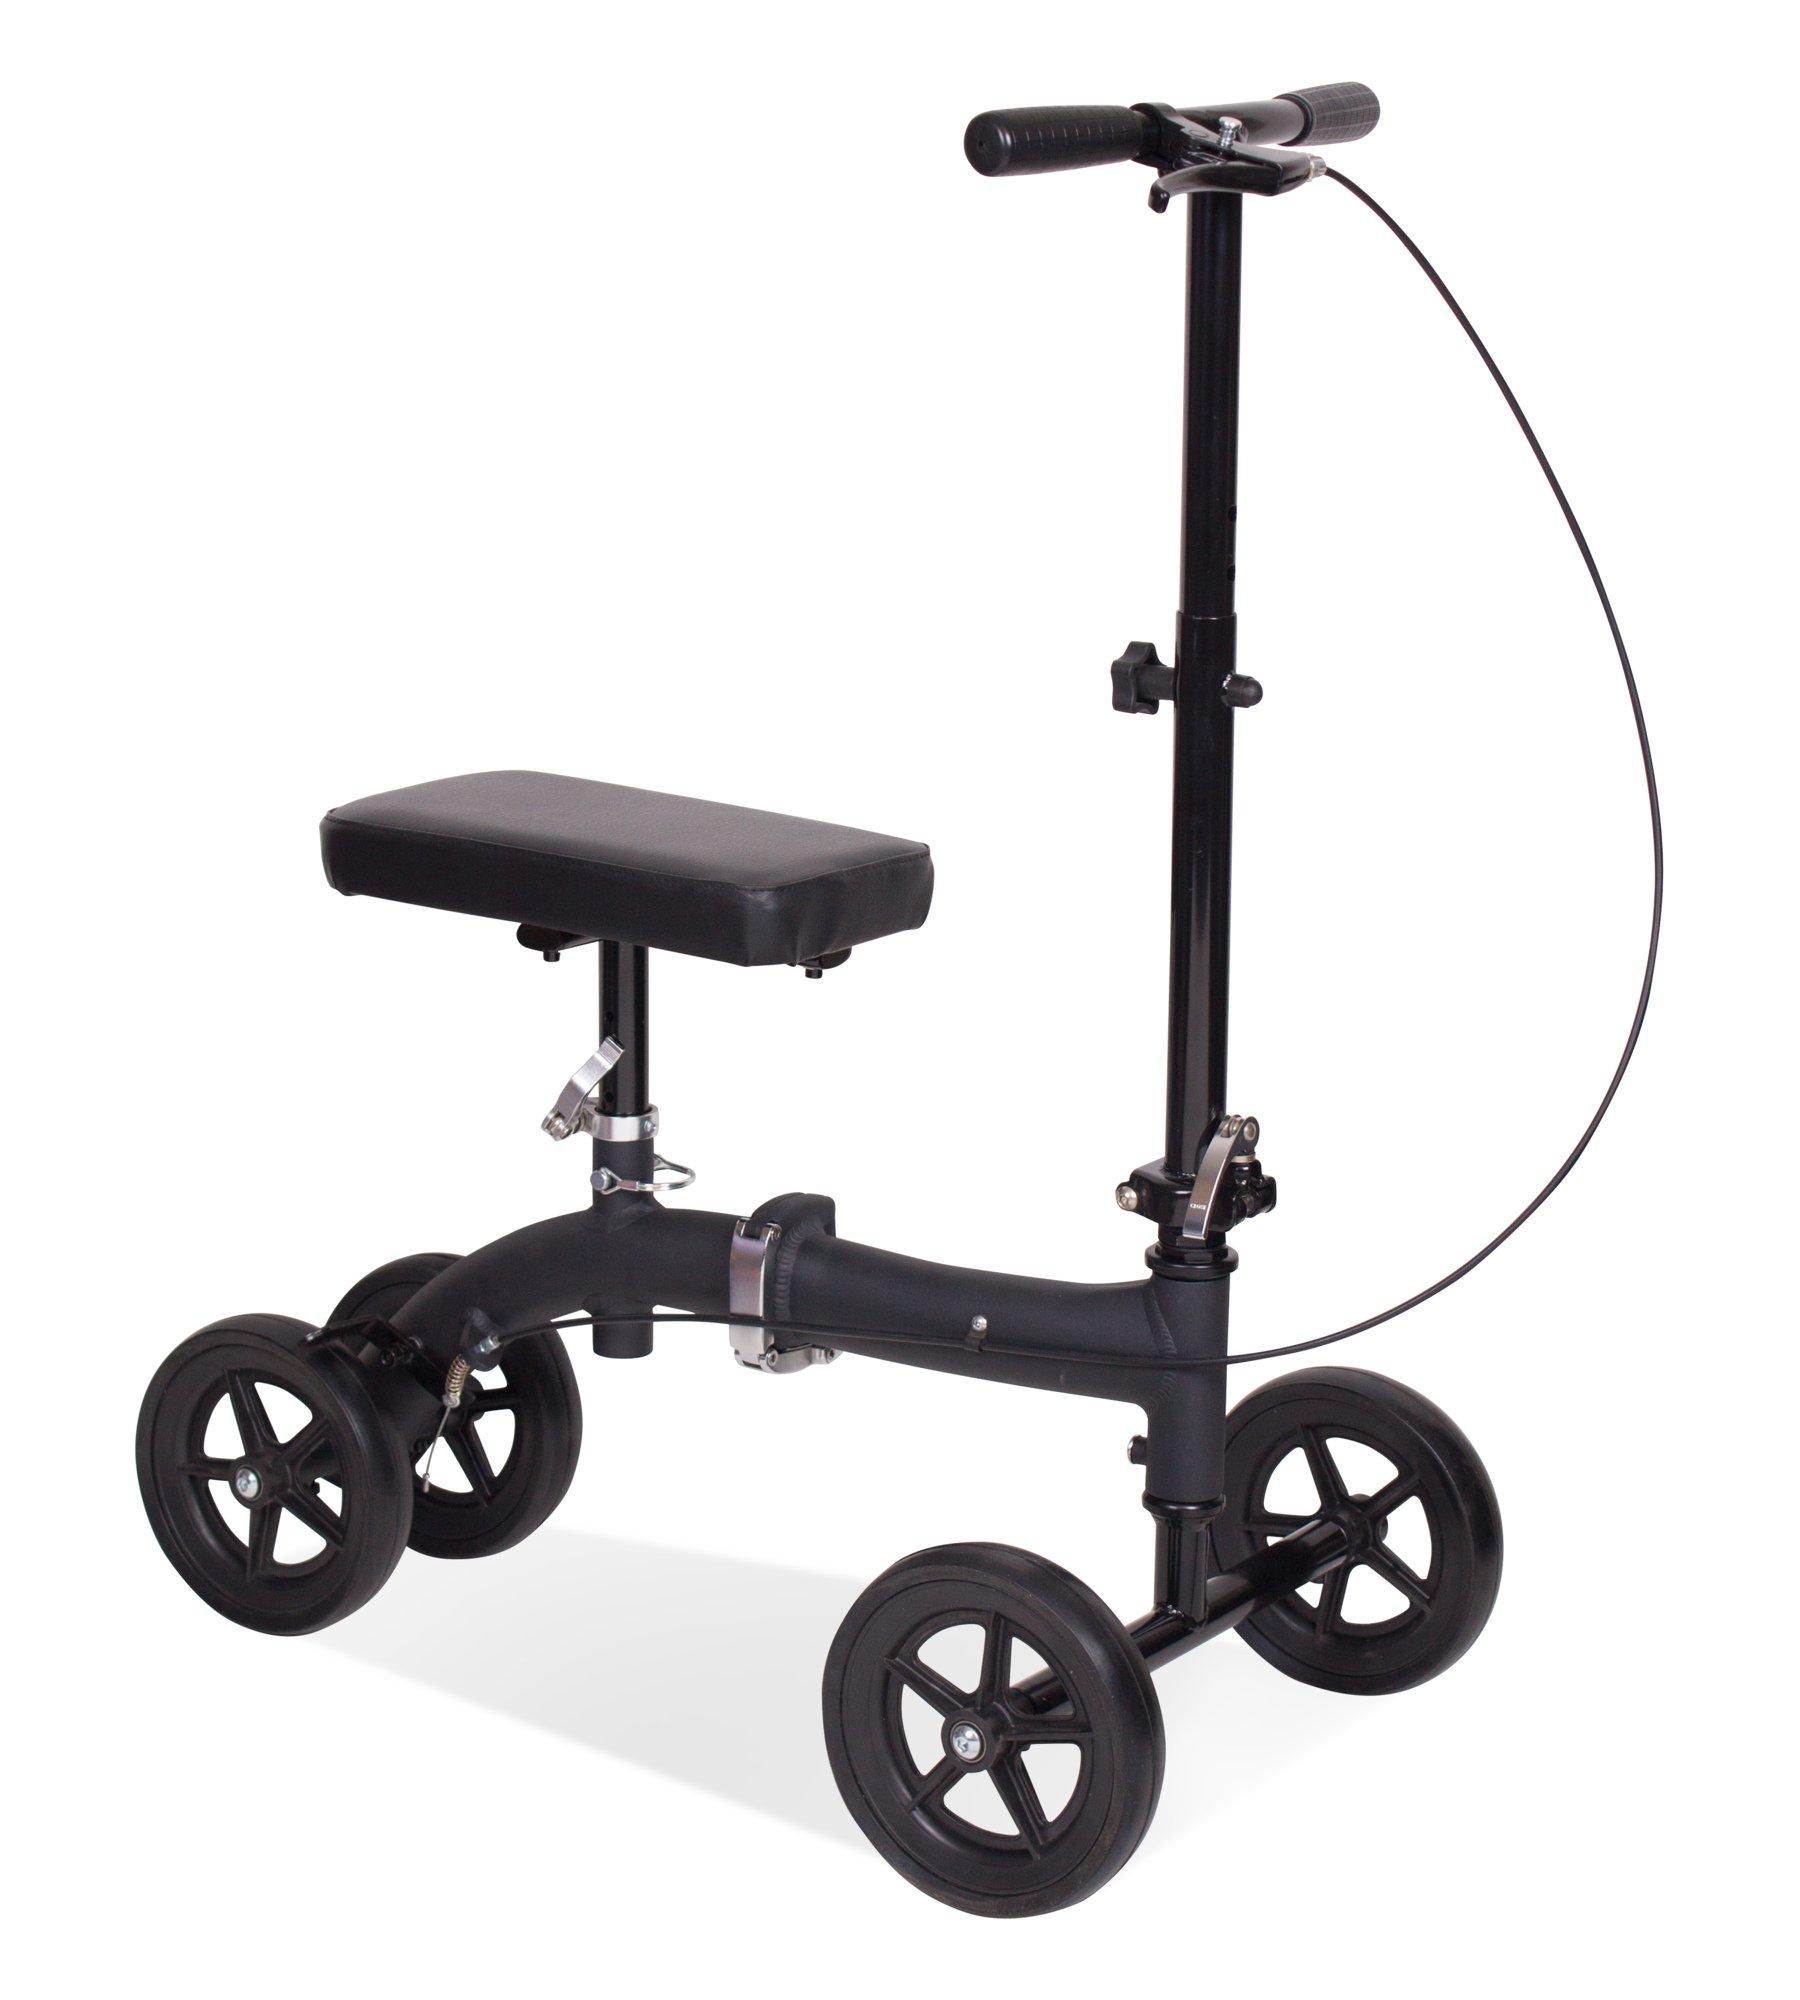 Carex Knee Walker/Scooter with Height Adjustment, Black, Crutch Alternative, 14 Pound